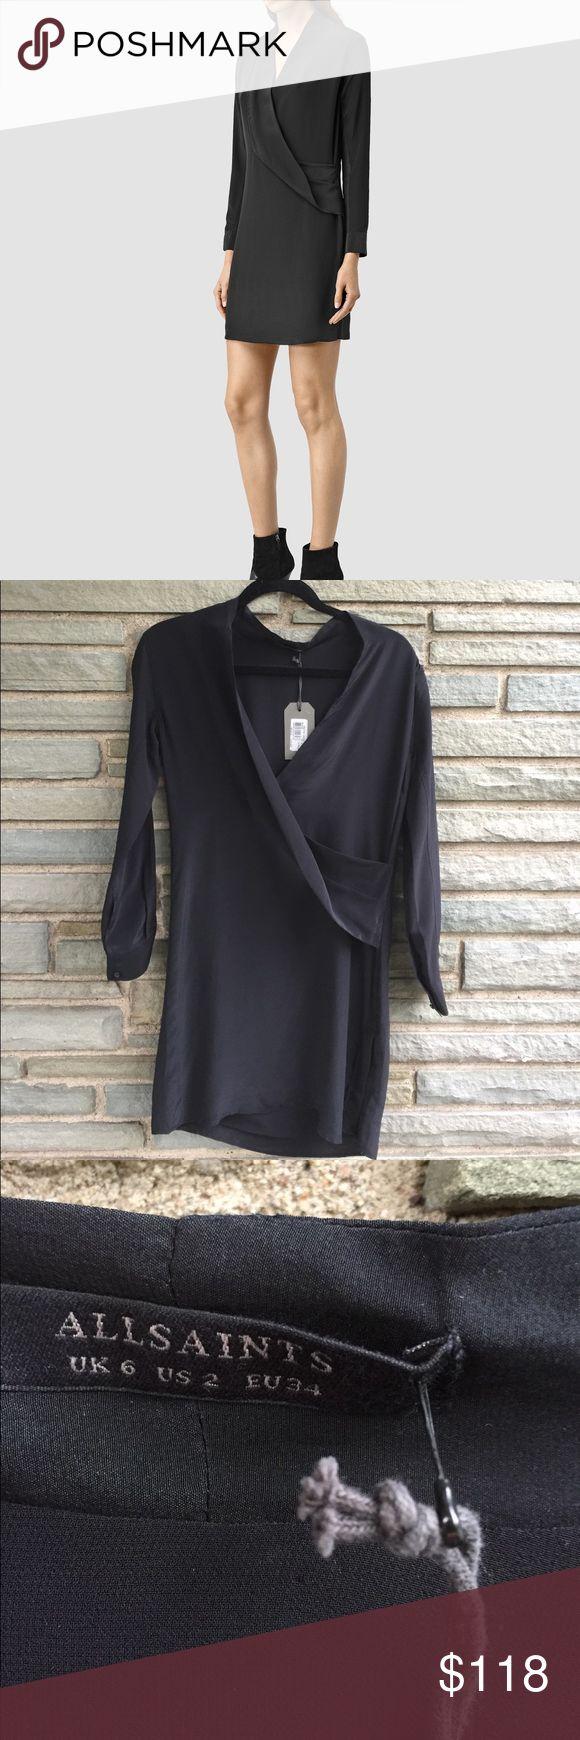 All Saints Walton Shirt Dress NWT. All Saints Walton Shirt Dress in Black. Long Sleeves, V-Neck, Interior Lining, Sheer Panel on Each Sleeve, Button Detail on Bottom Side. All Saints Dresses